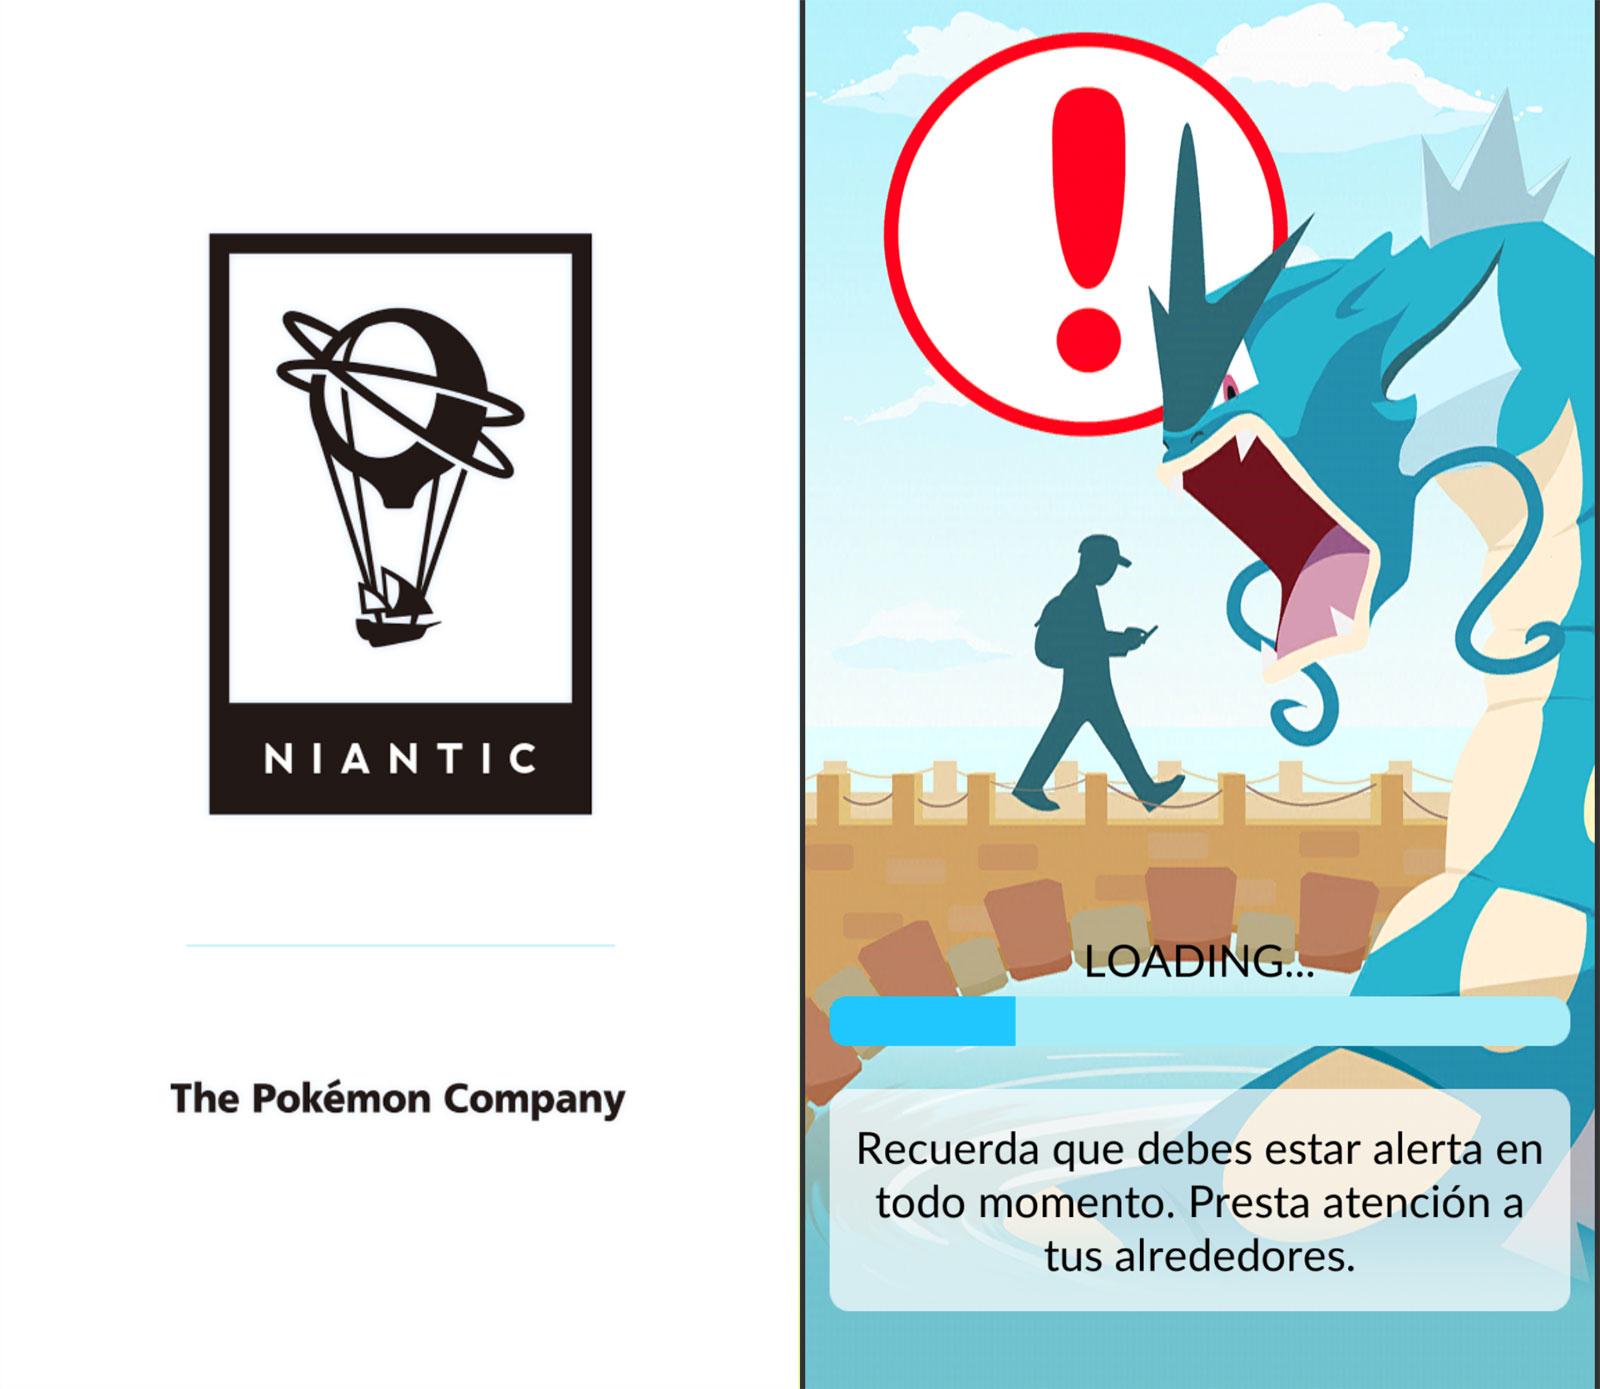 Pokémon Go al abrirse